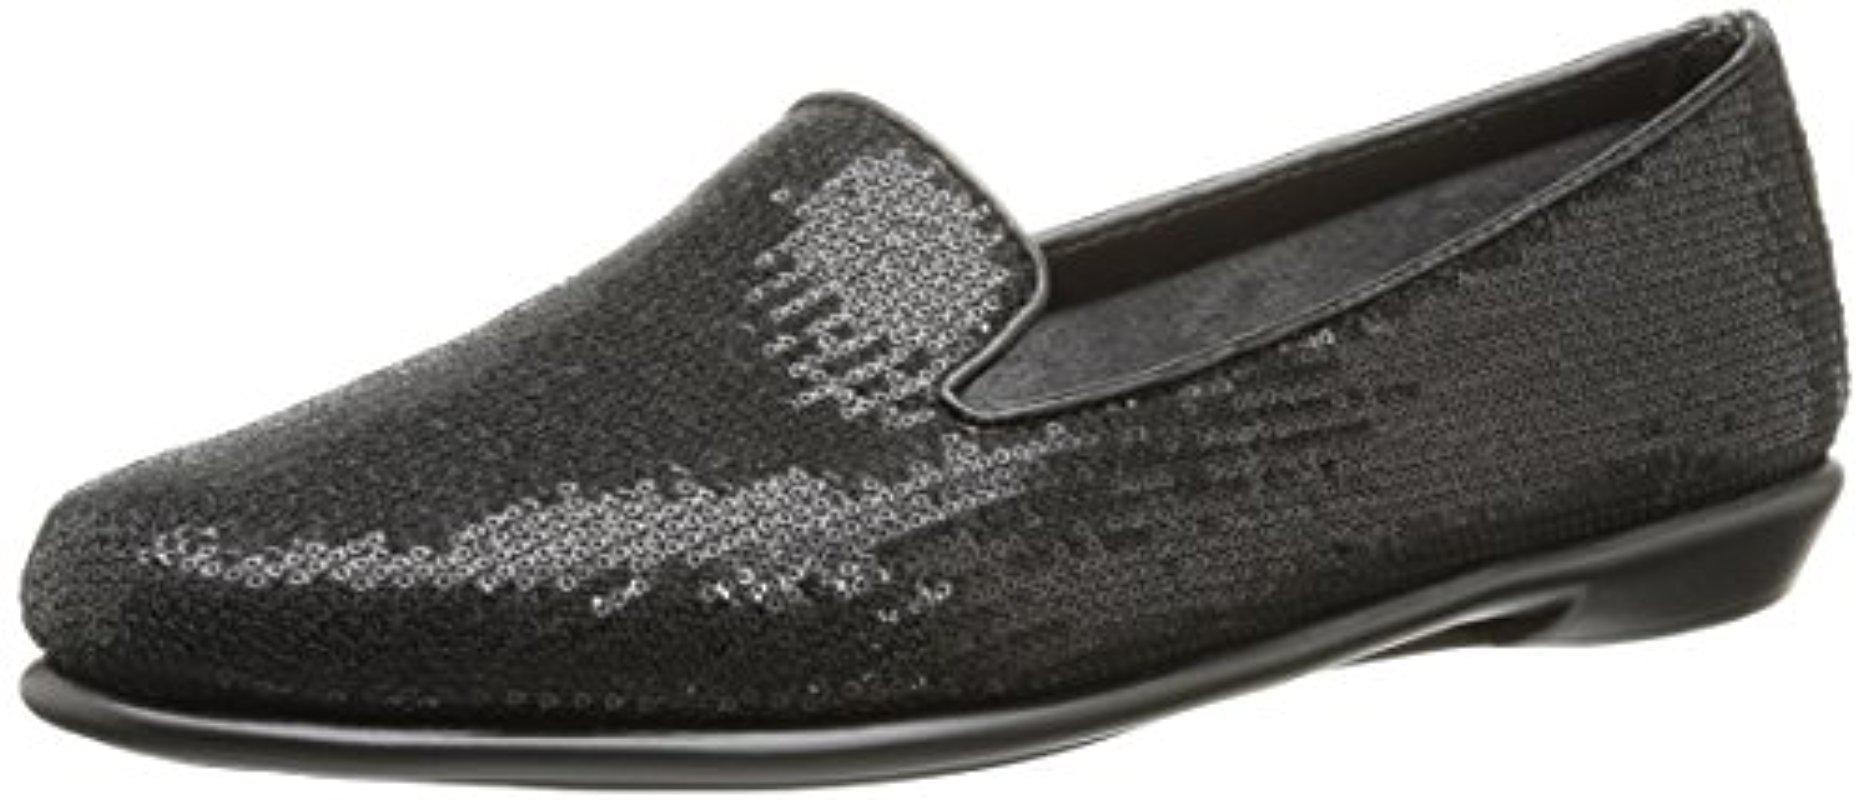 d8b4f50e254 Lyst - Aerosoles Betunia Loafer in Black